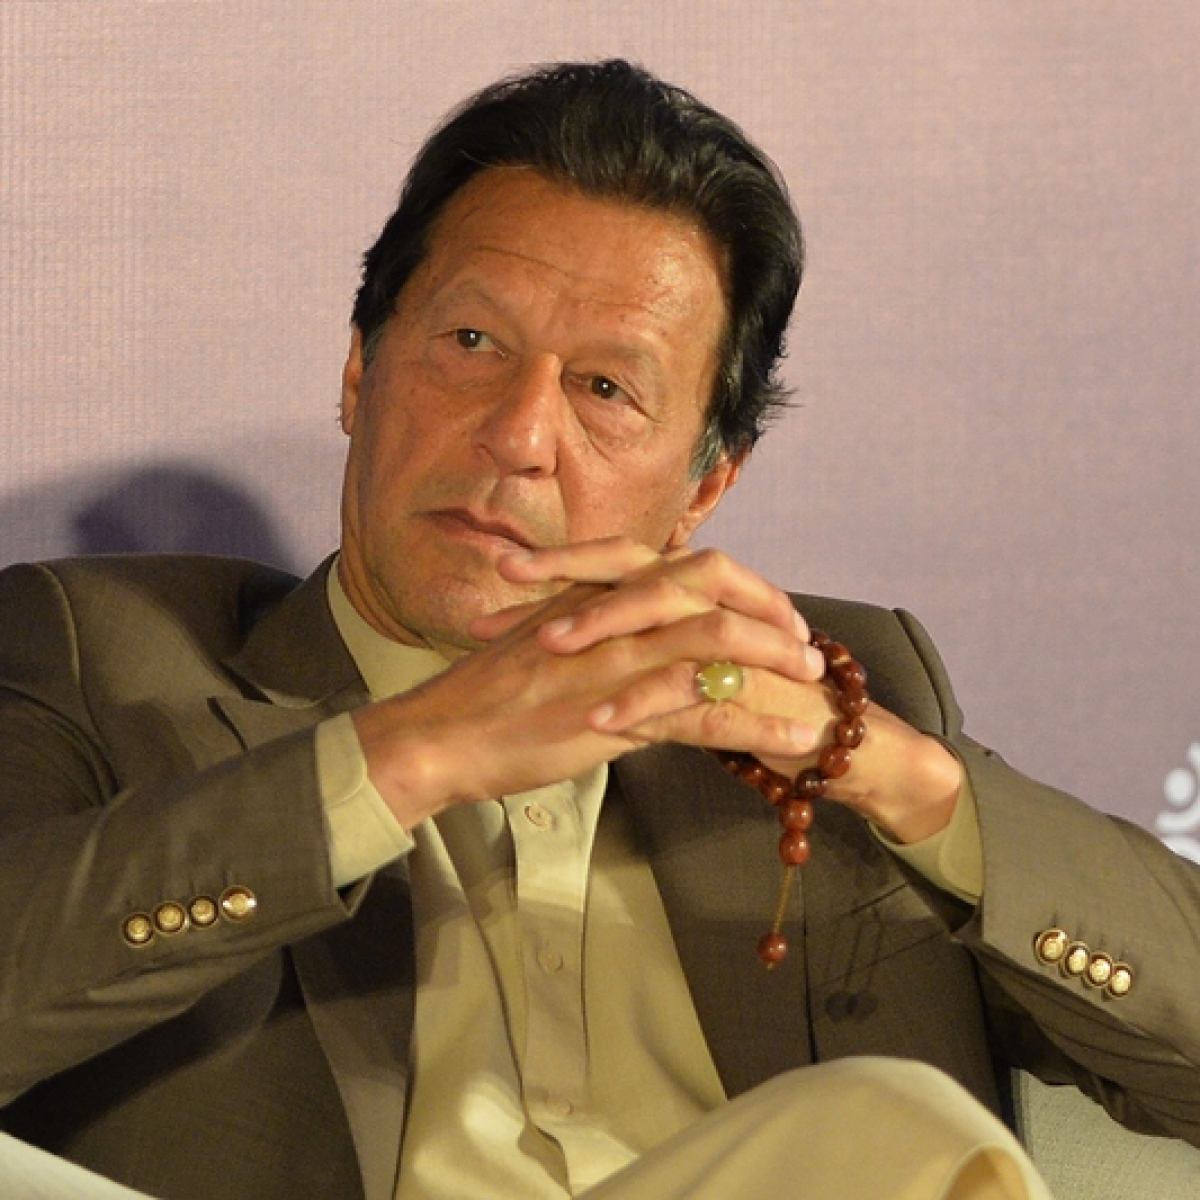 Pakistan chips in on leaked 'Balakot chats', Imran Khan slams Indian govt over 'false flag operations'